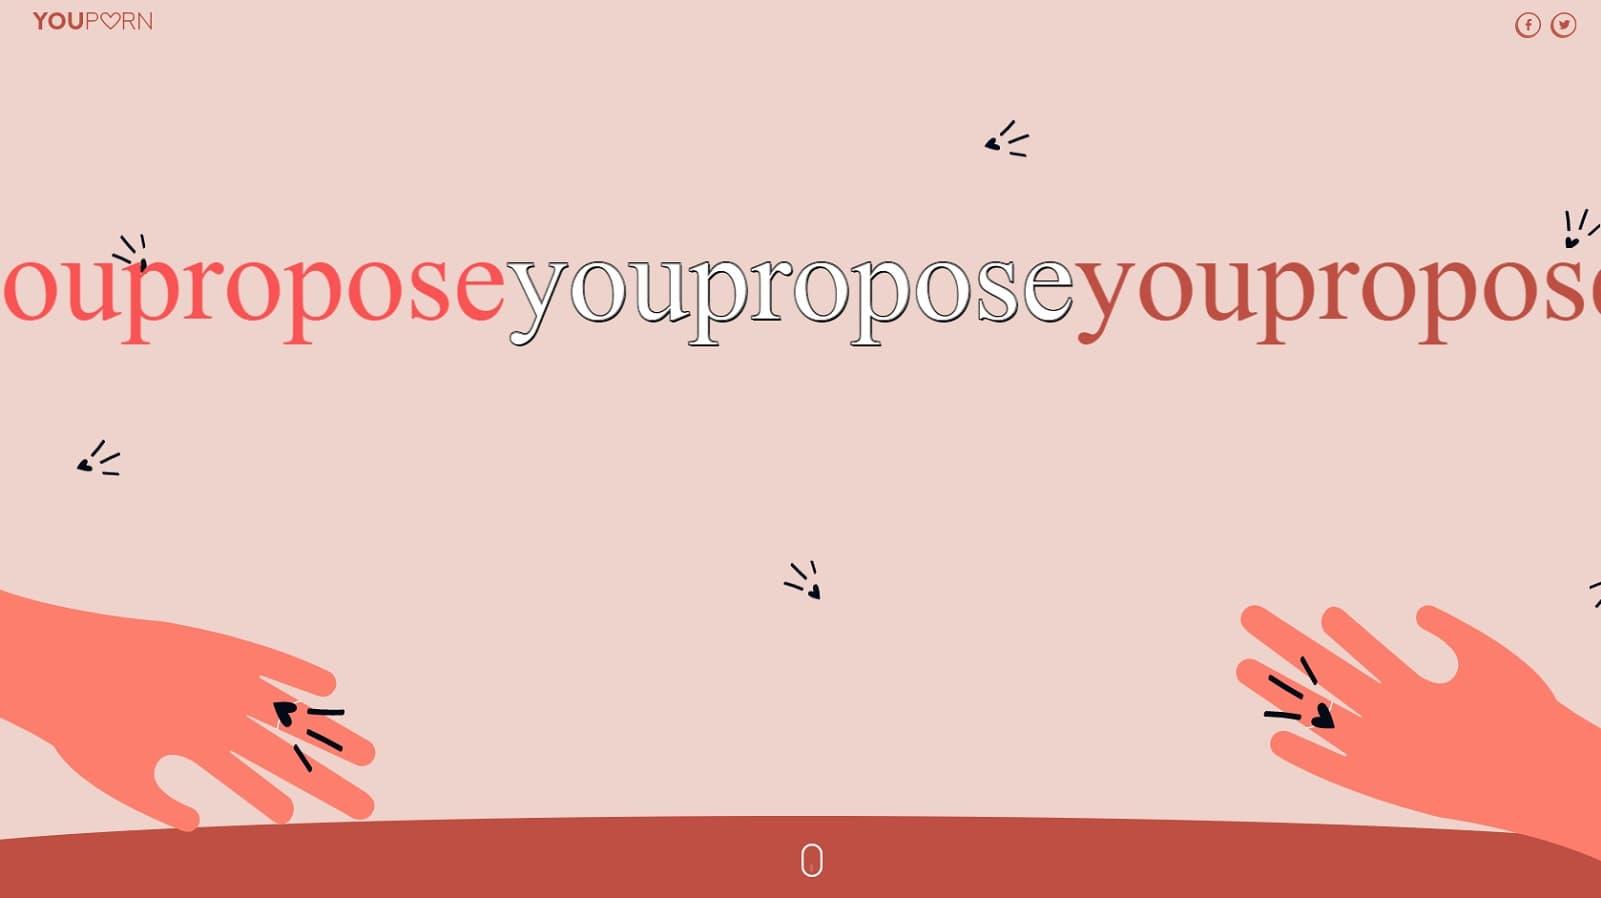 youpropose